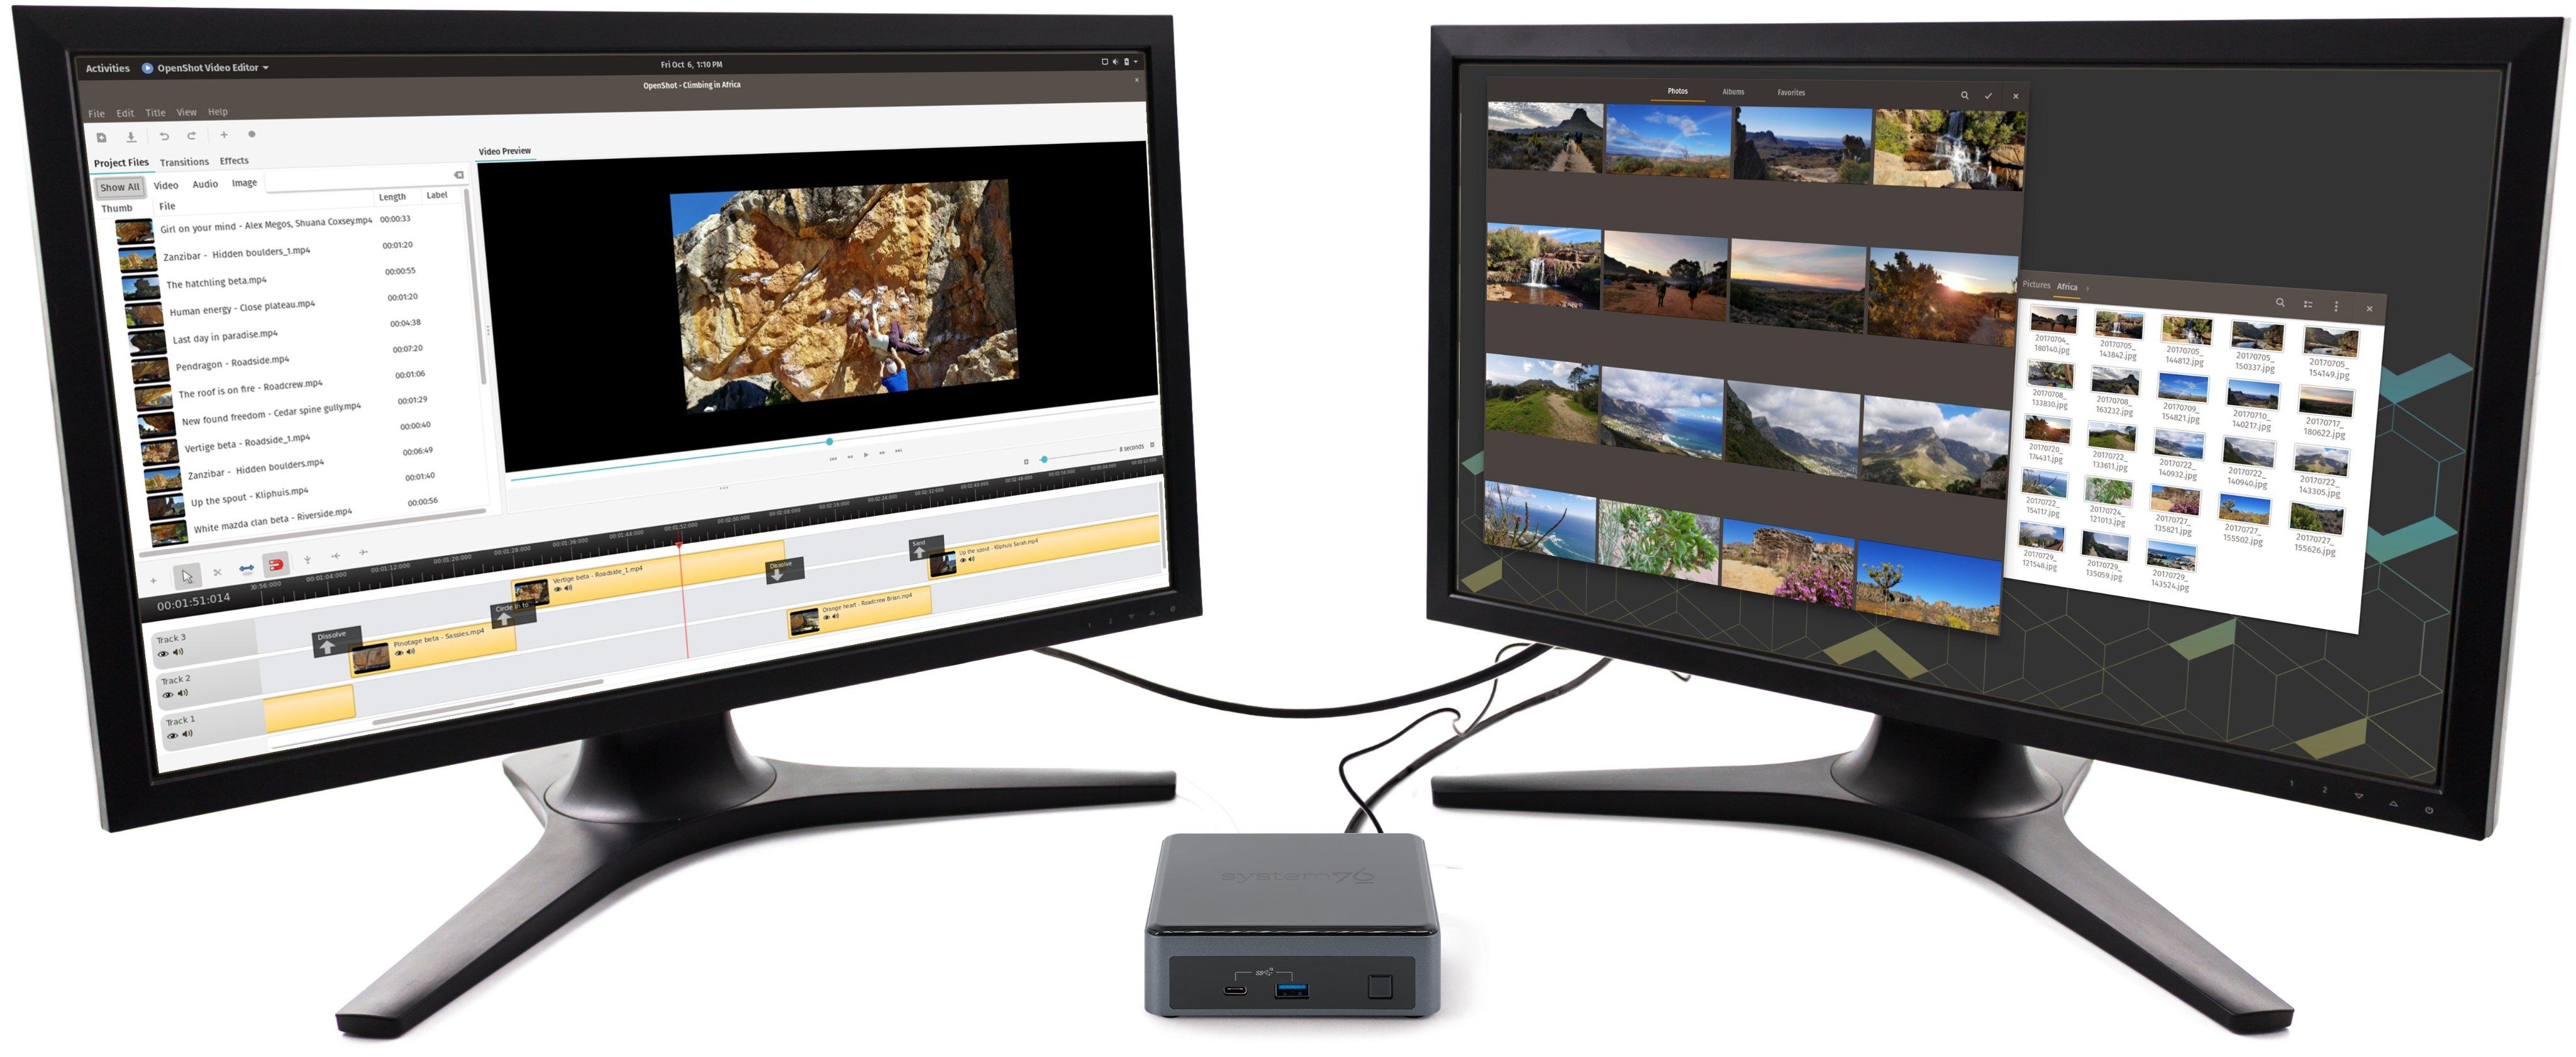 Meerkat desktop between two displays, editing a skiing video